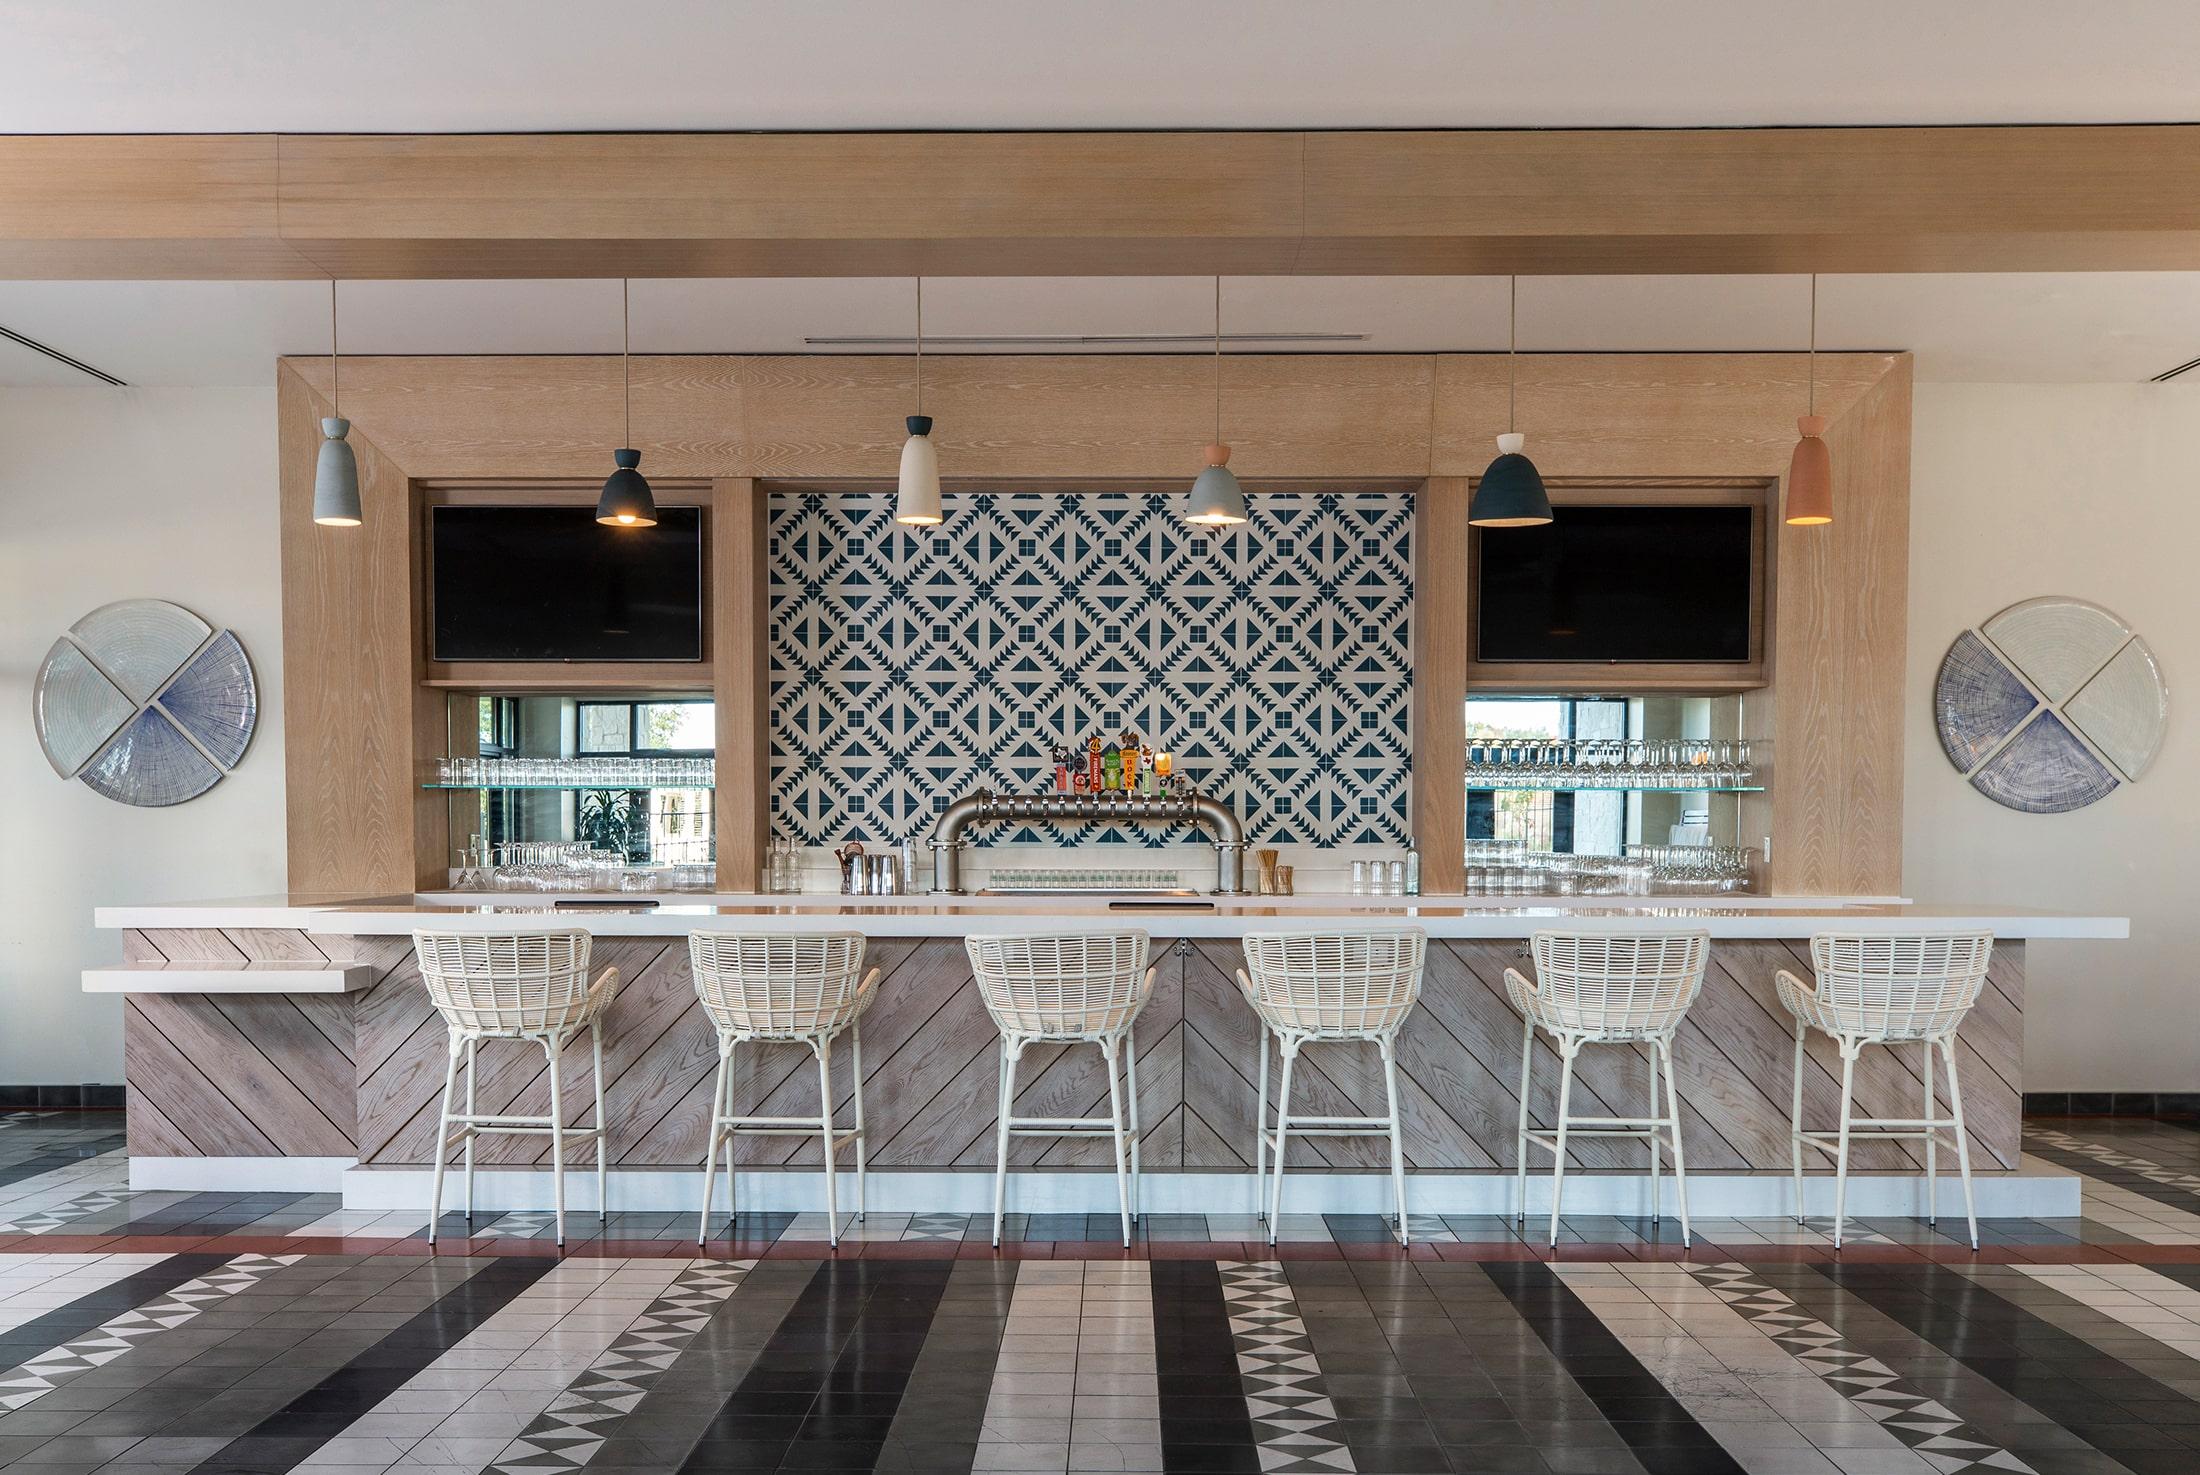 Bar Interior Design at Omni Barton Creek in Austin, Texas